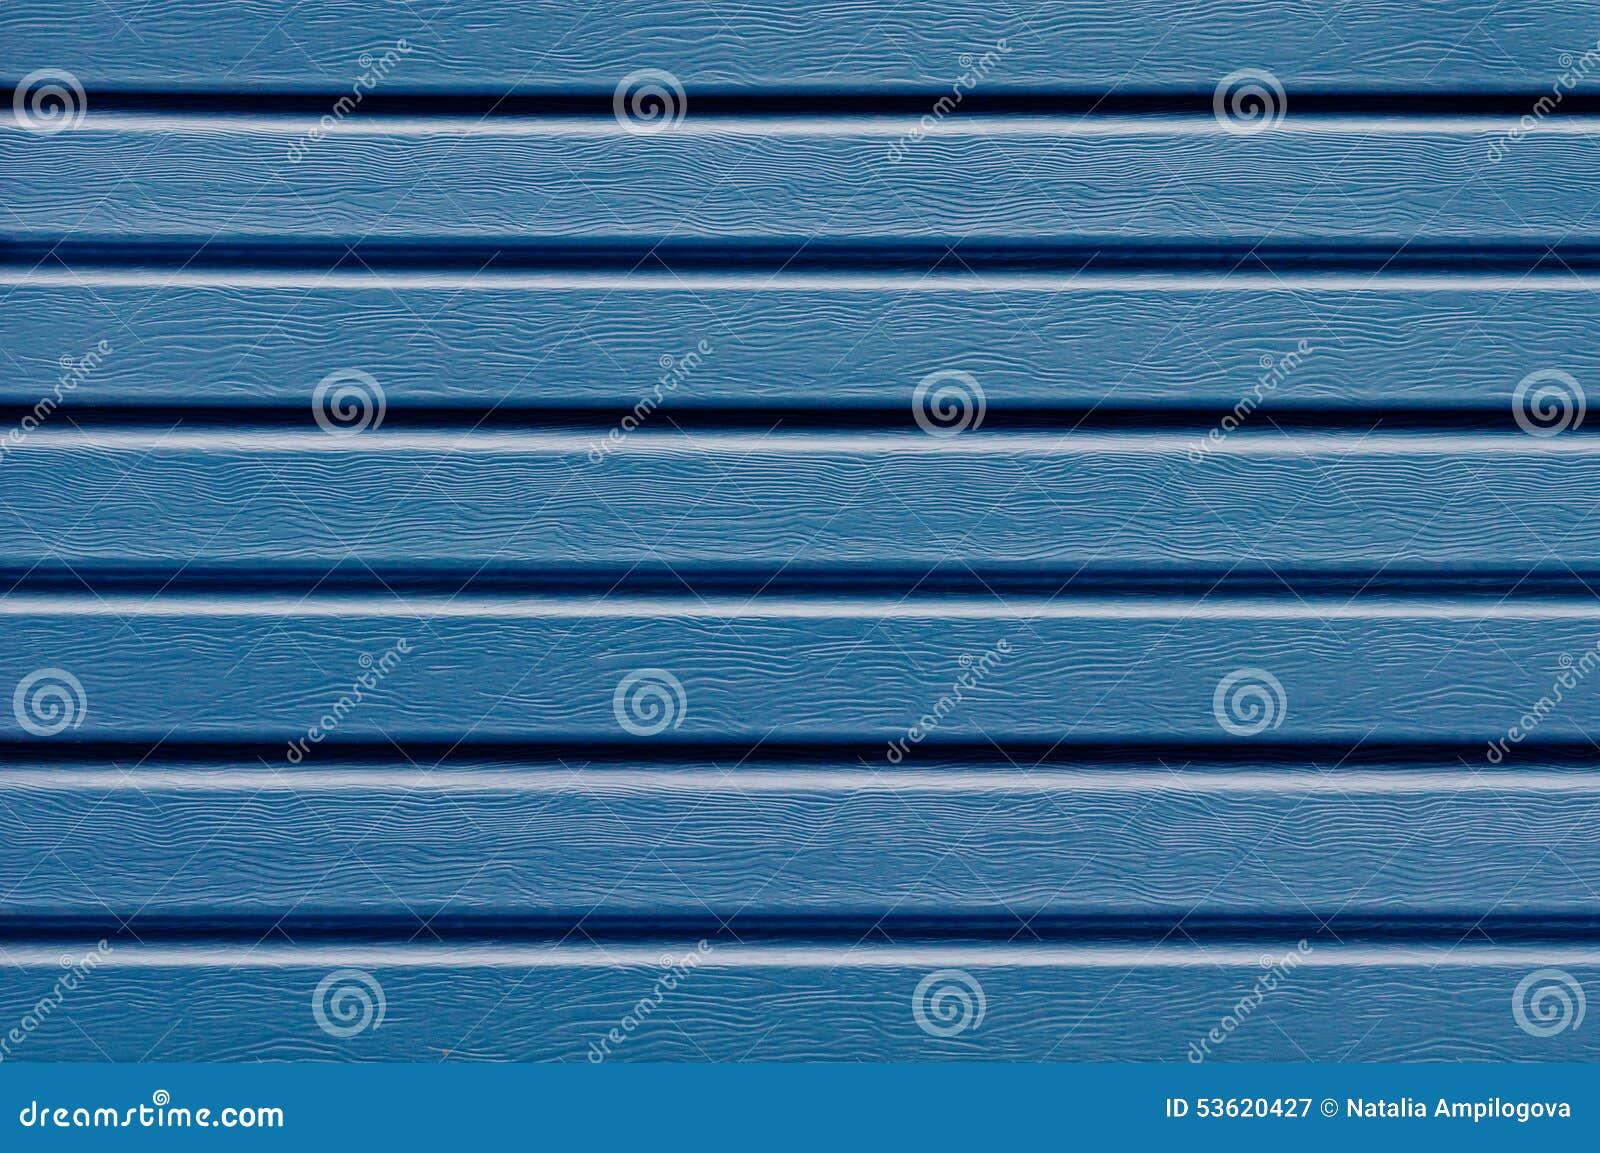 Wooden, Vinyl Plastic Panels Texture Stock Photo - Image: 53620427